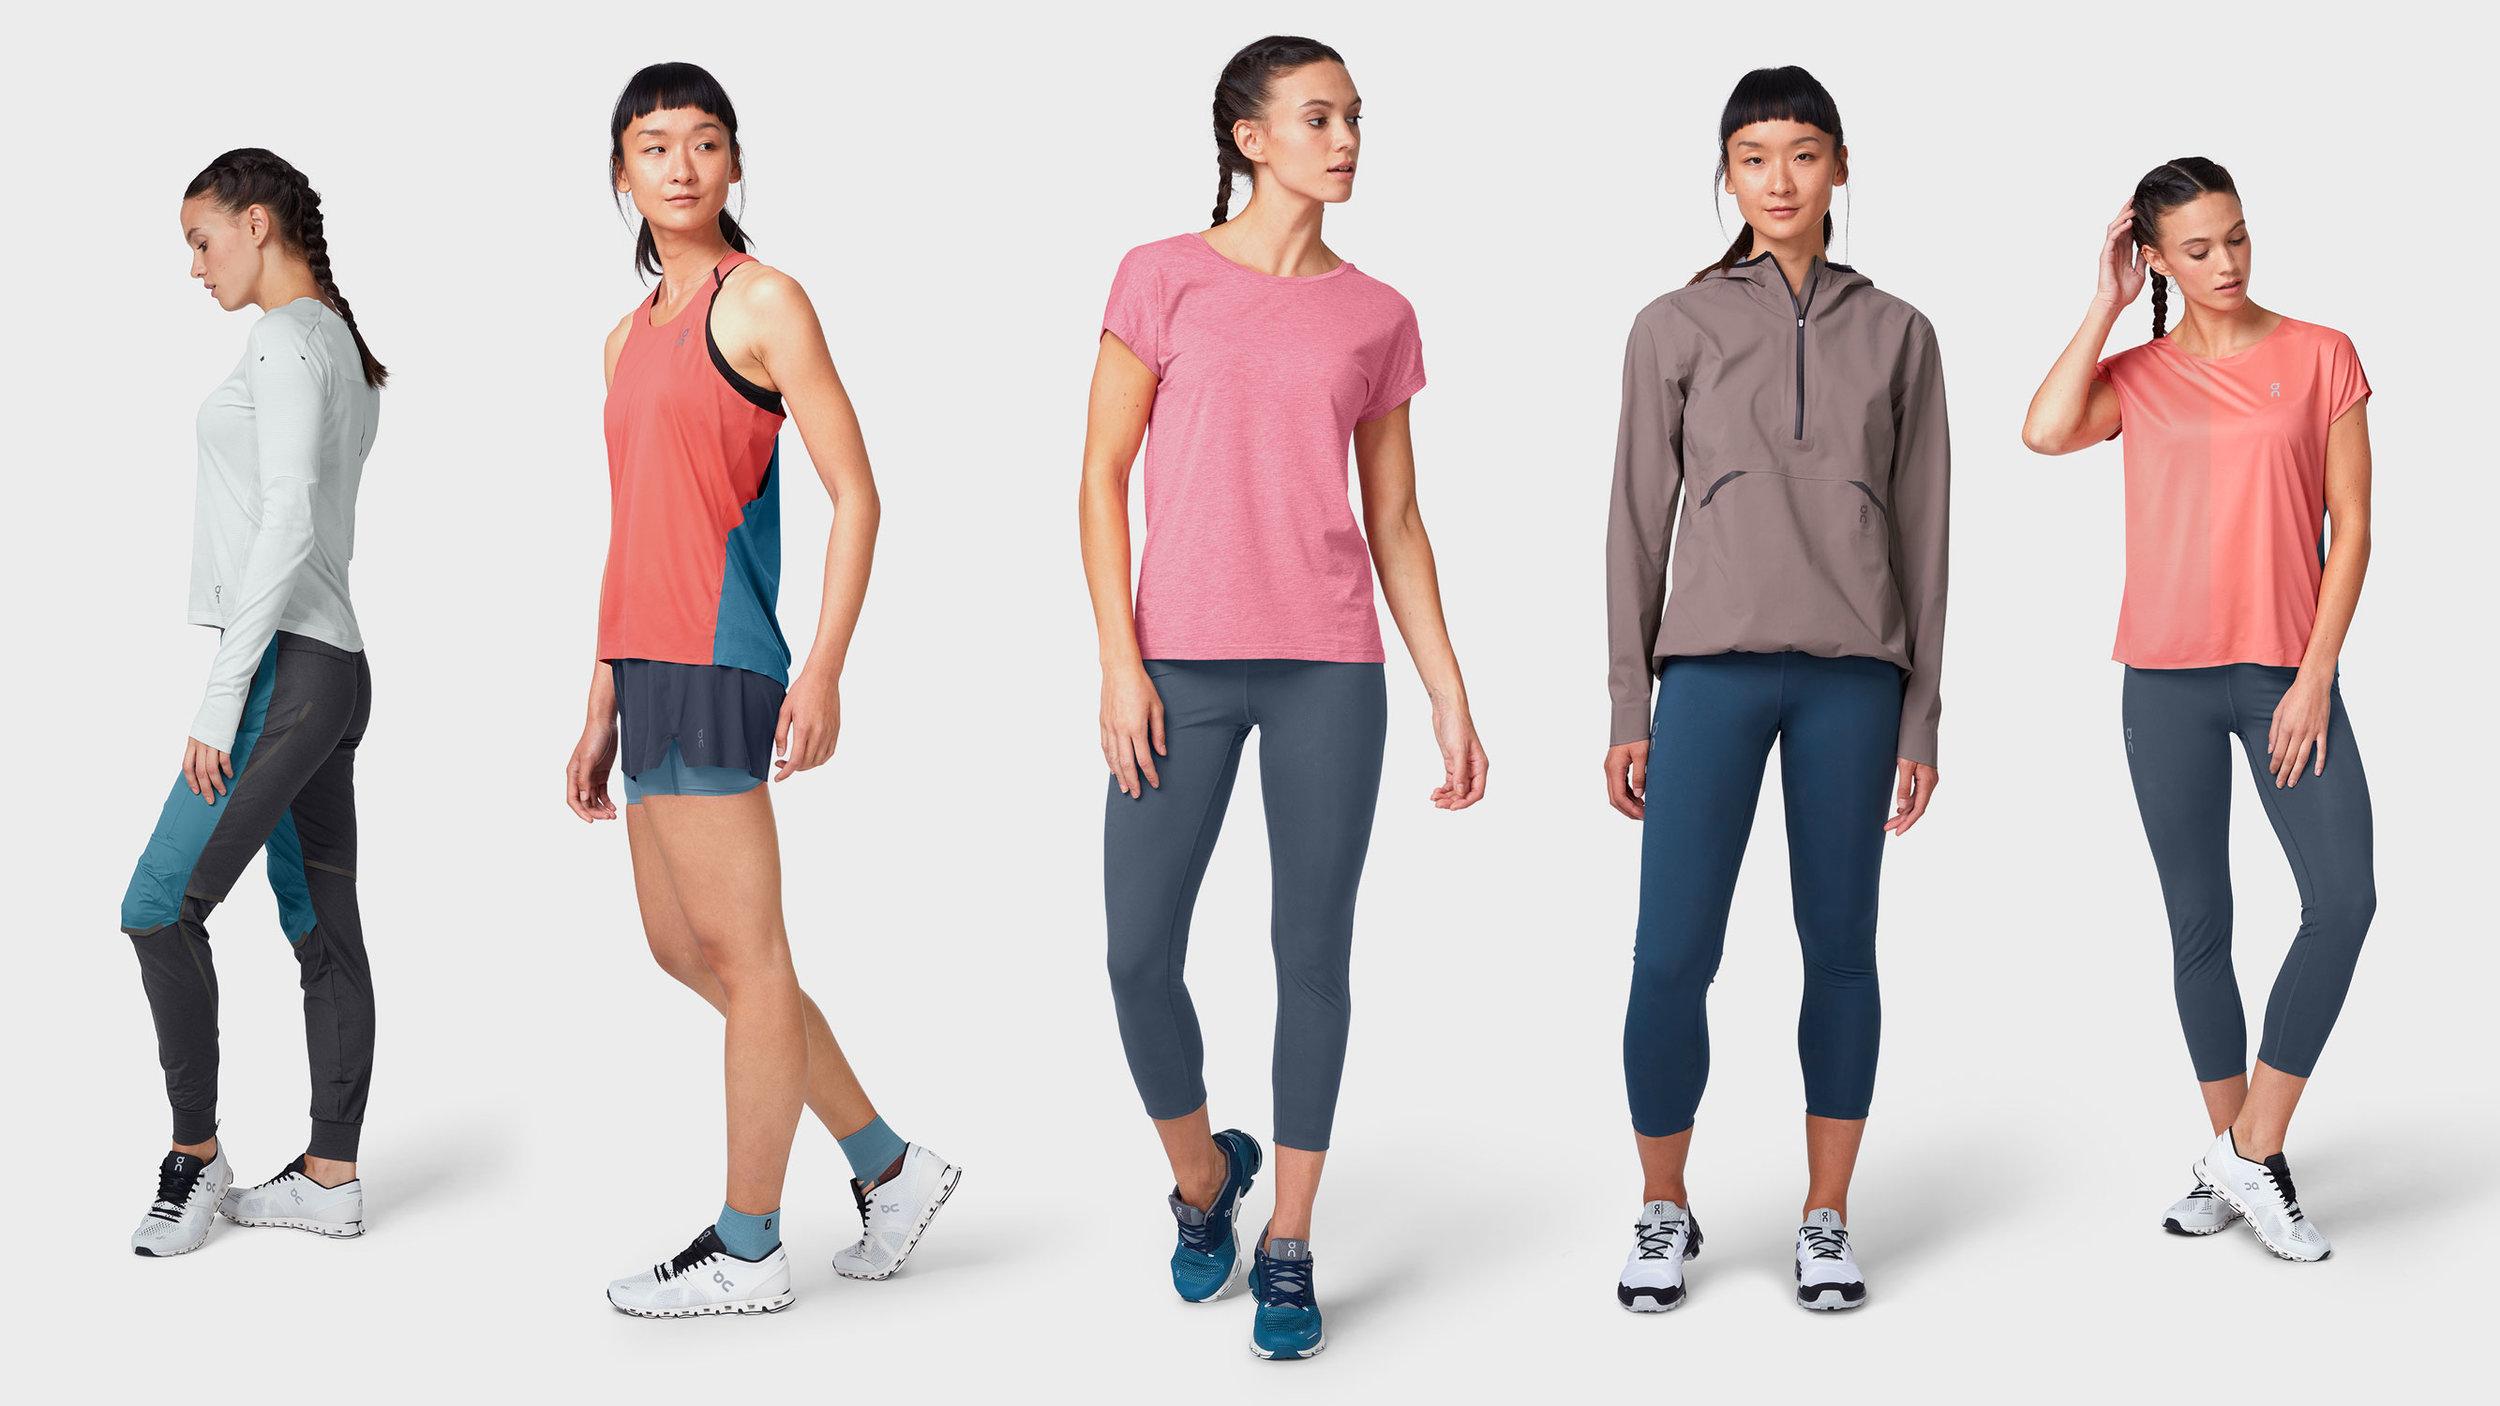 Womenswear-ecommerce-packshoit-photography.jpg